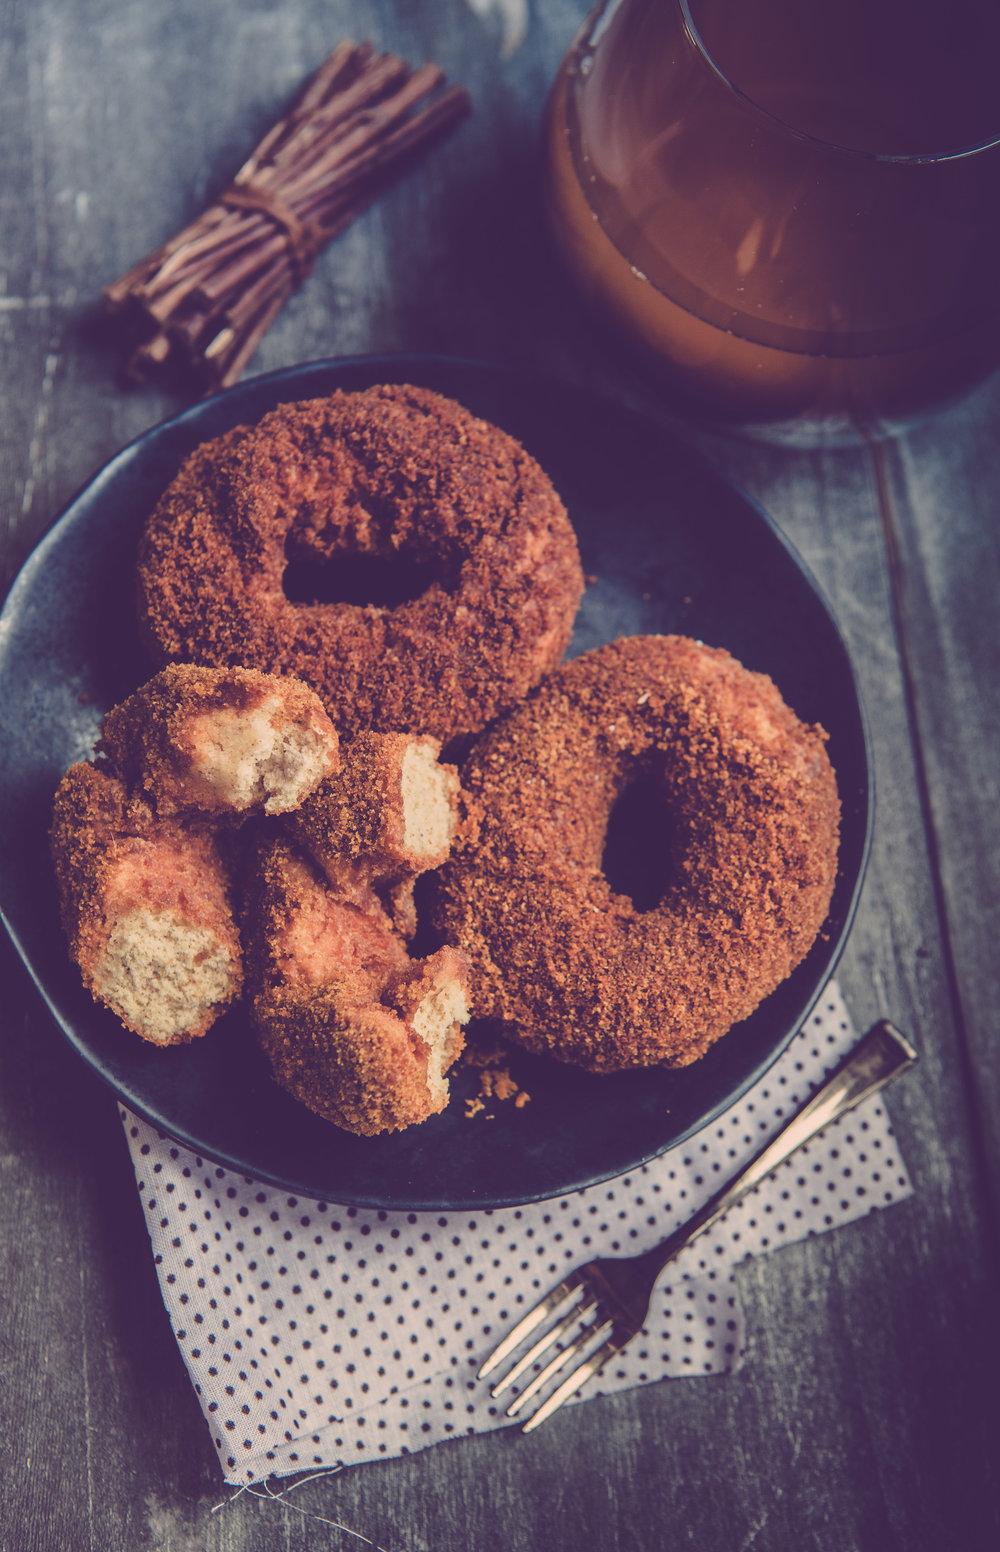 apple cider donuts.jpg